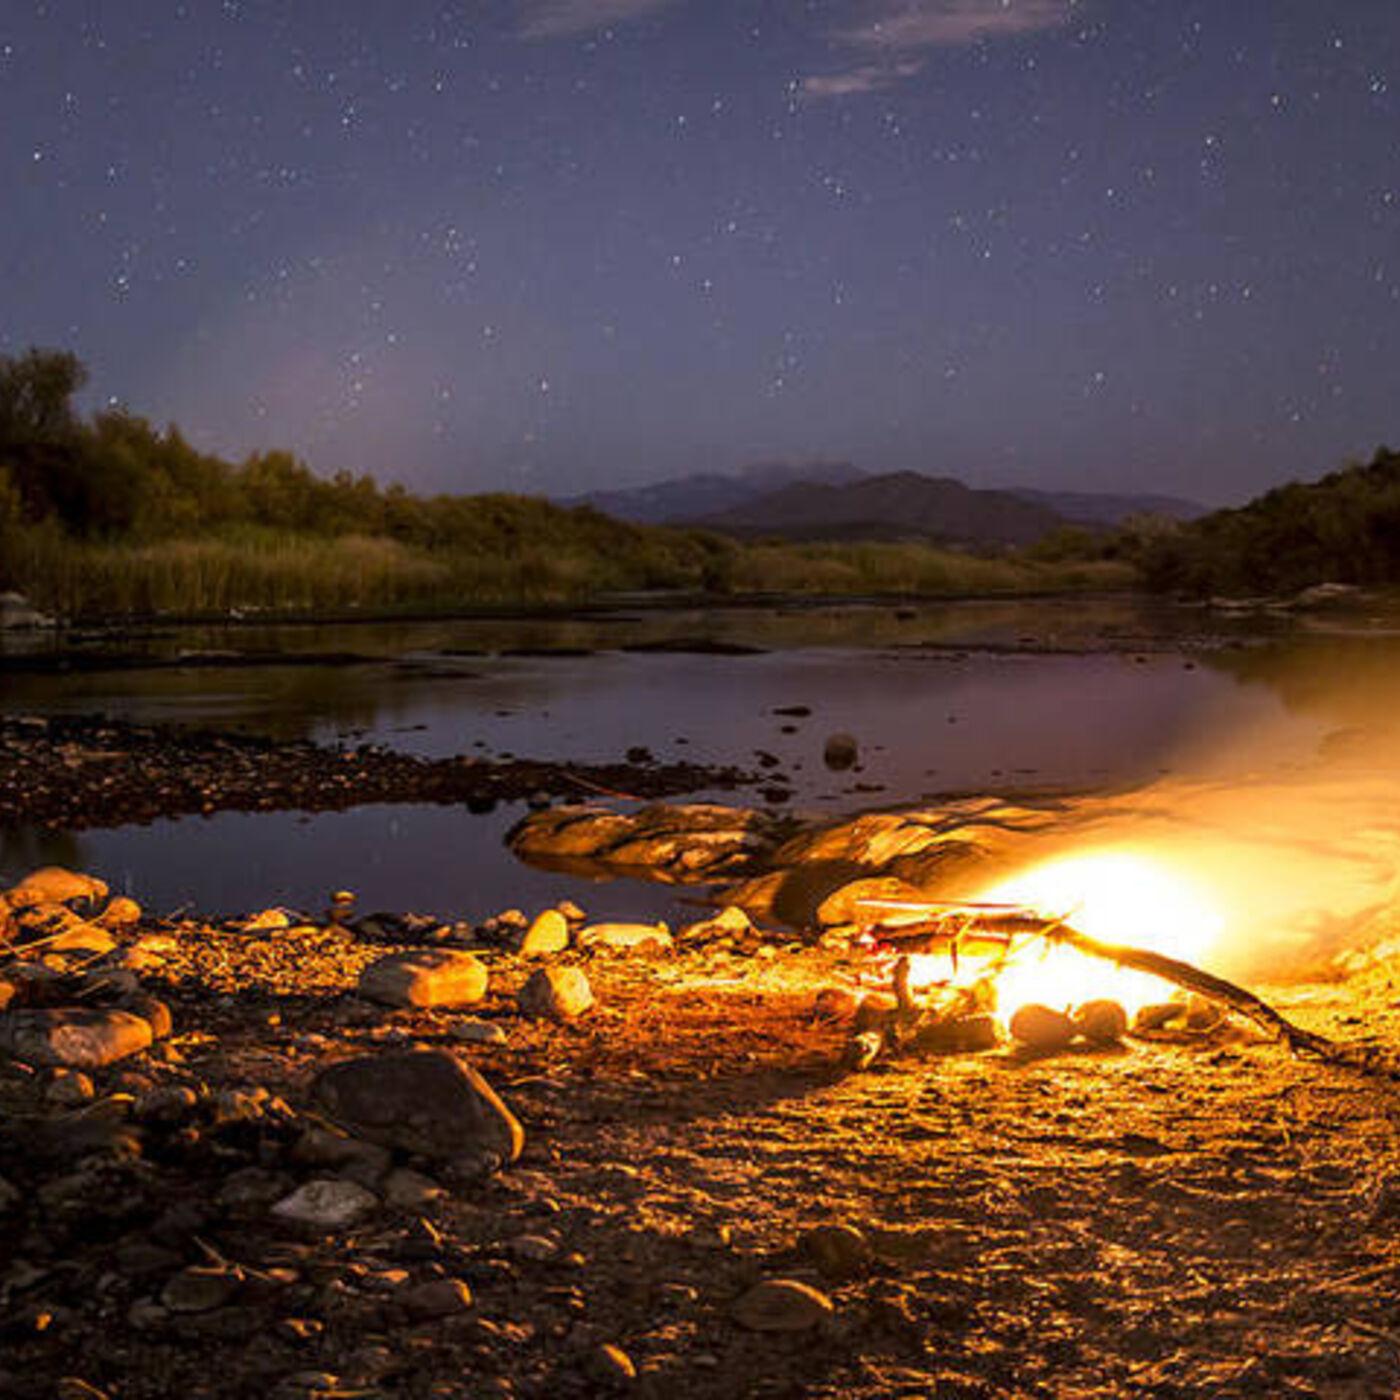 A Campfire and Train Ride